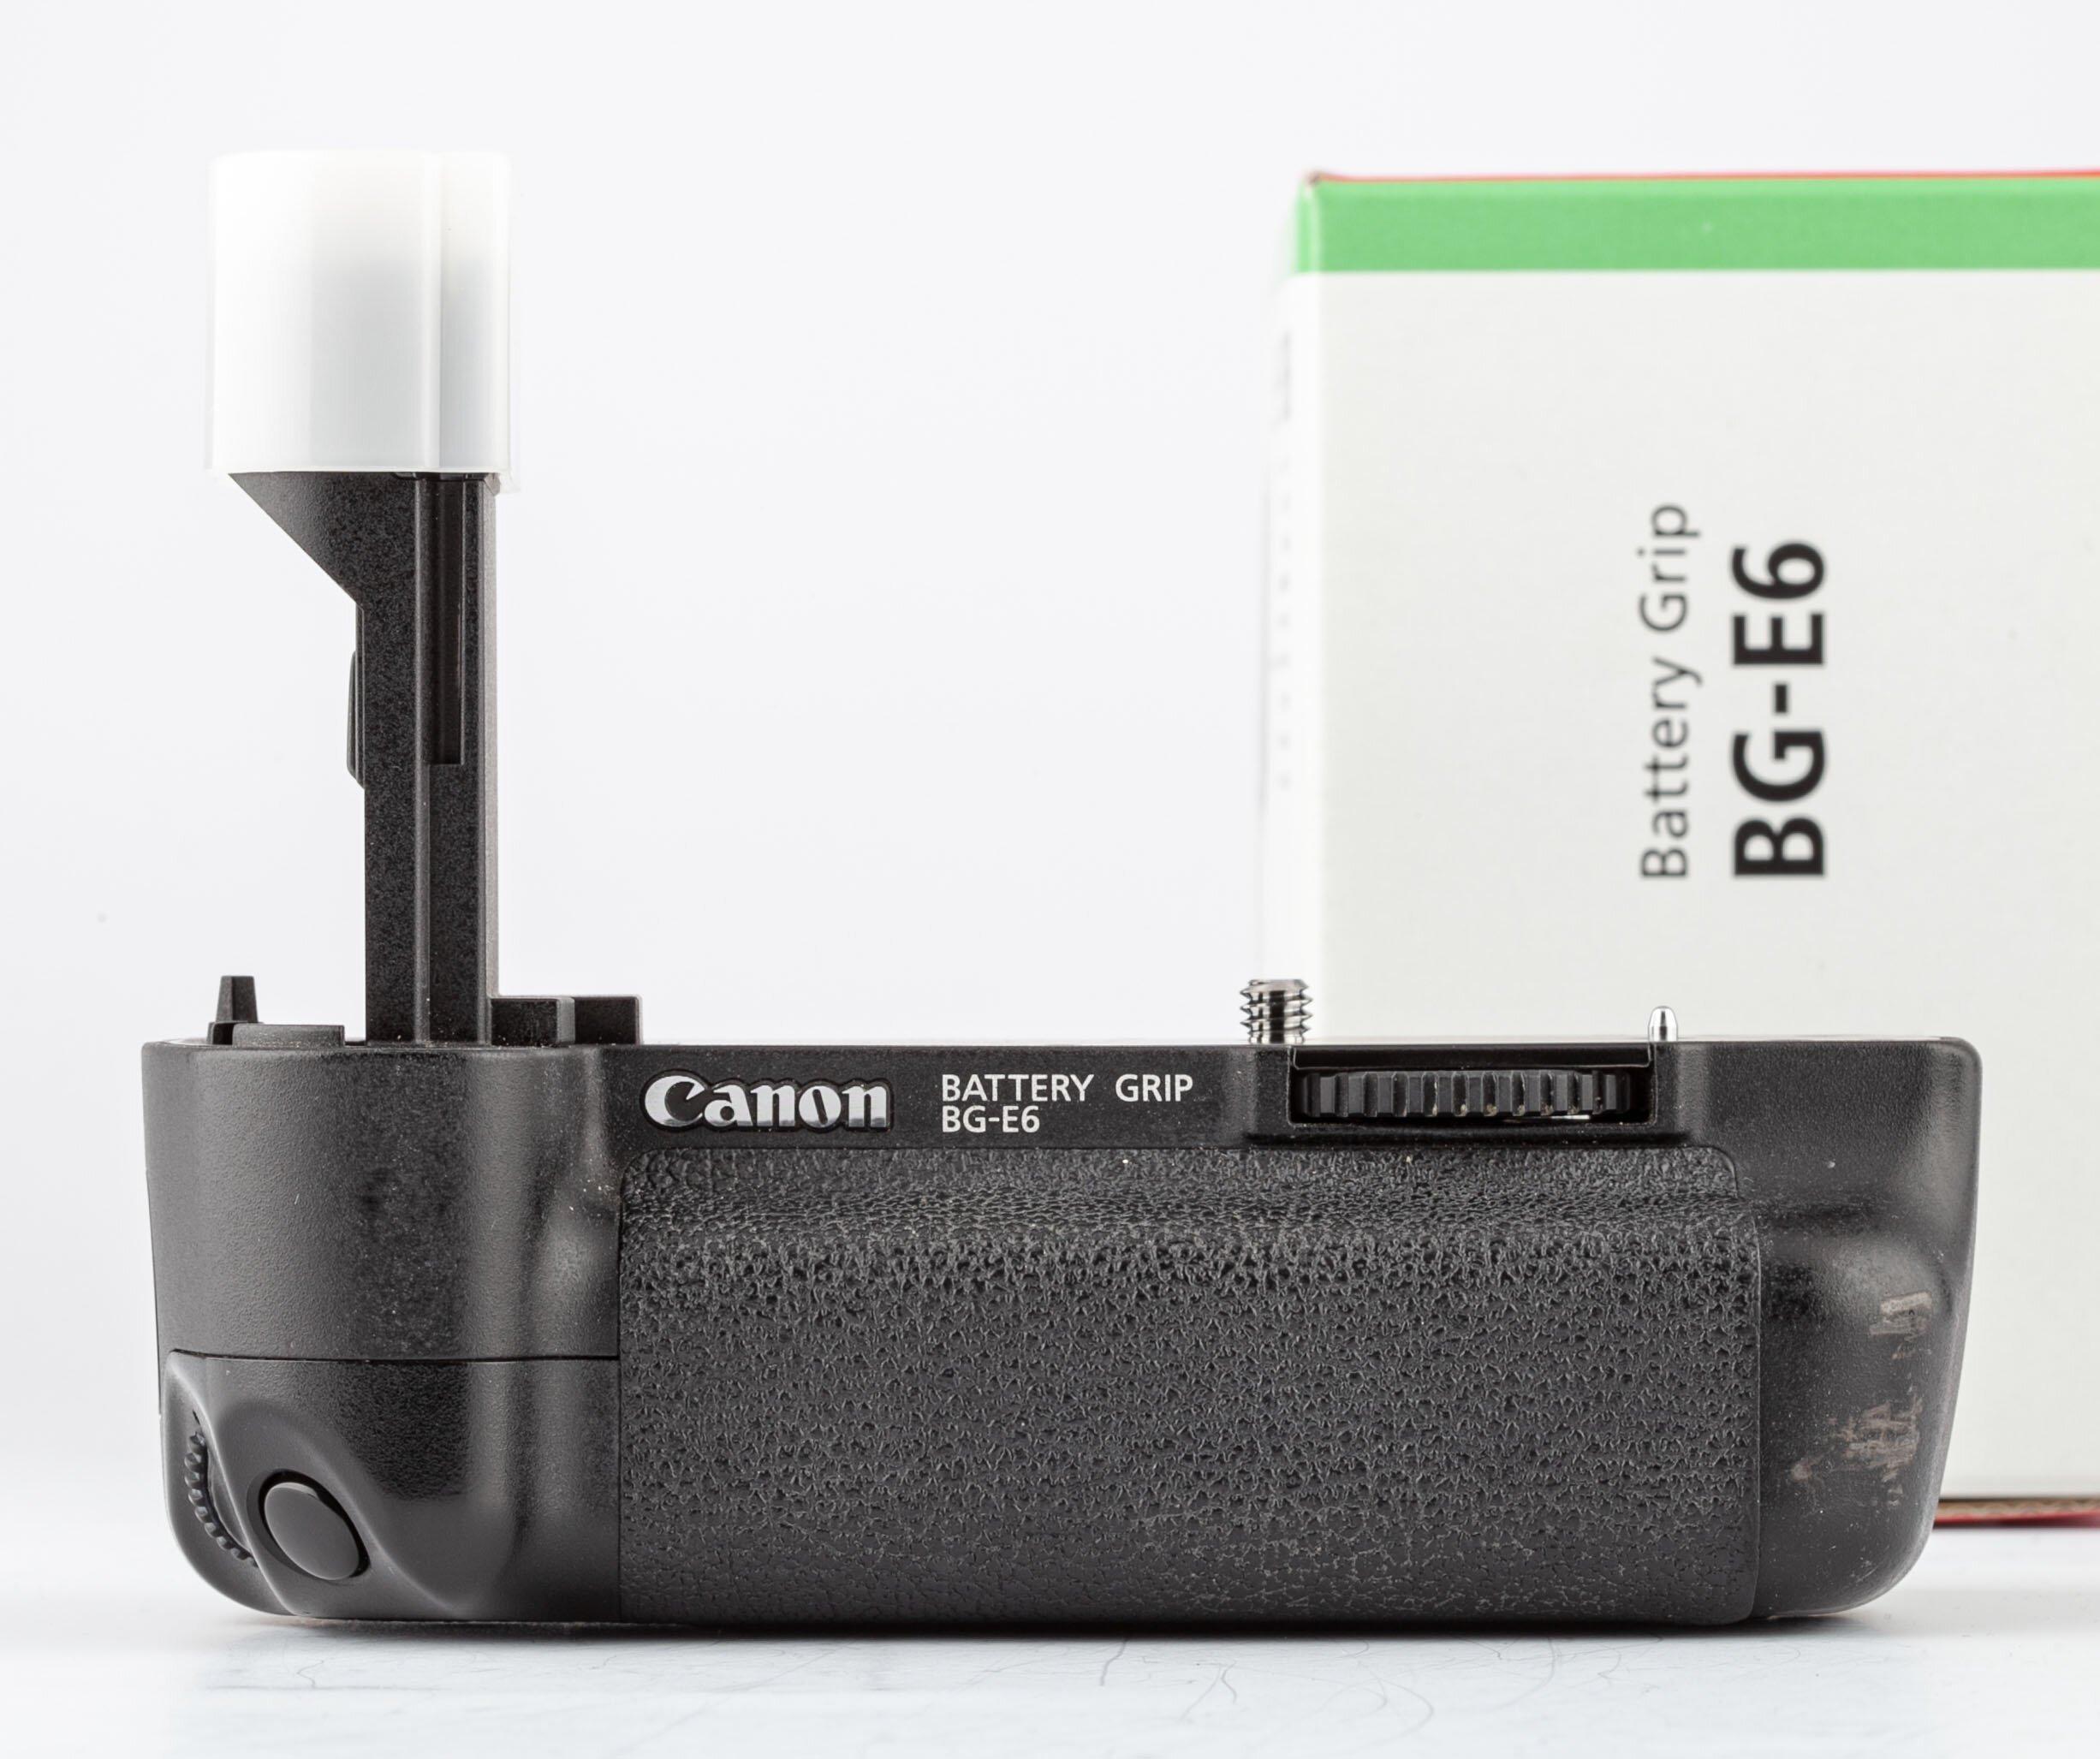 Canon Battery Grip BG E6 for EOS 5D MKII